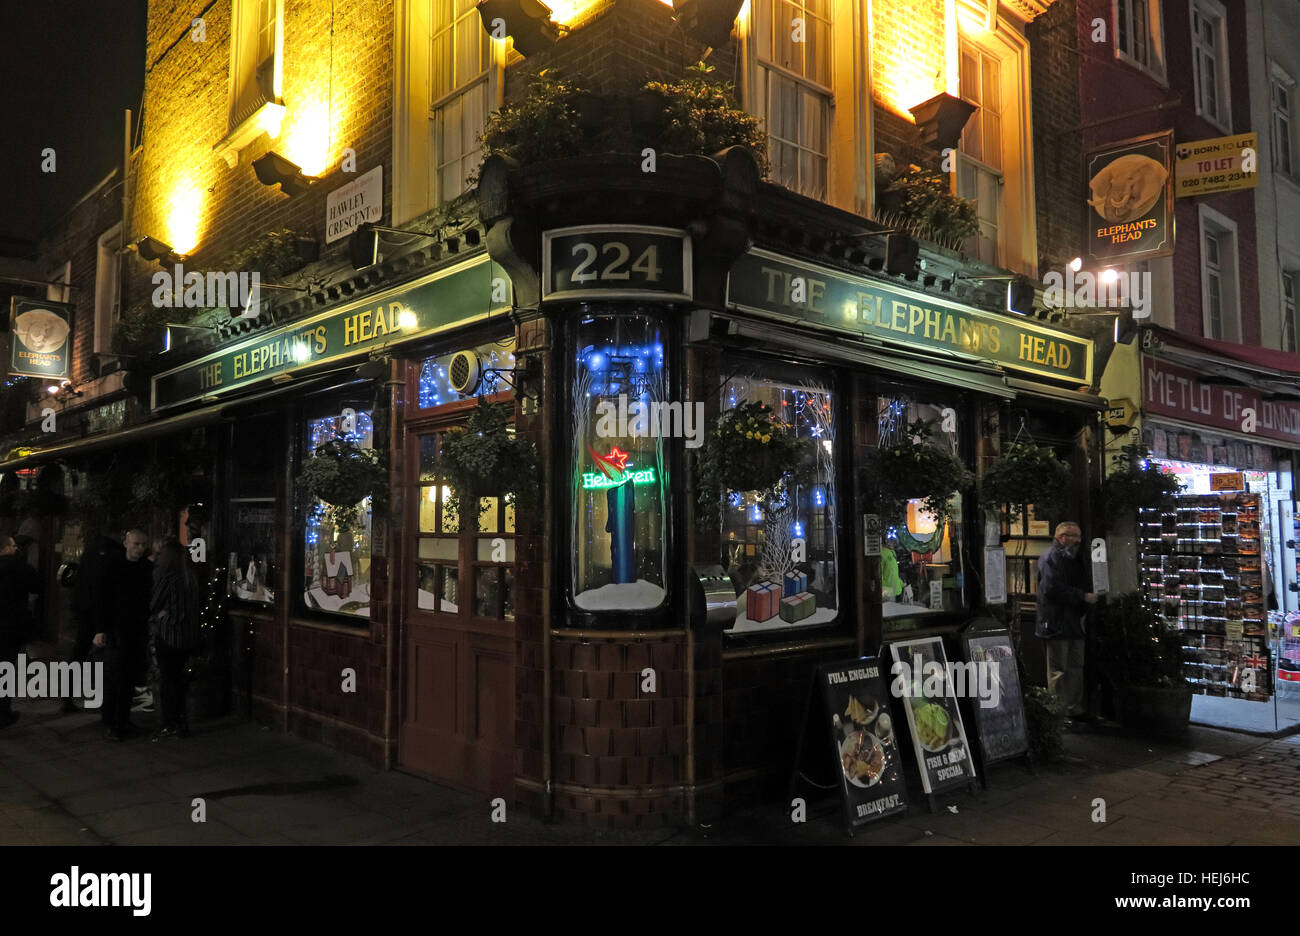 Camden Town bei Nacht, Nord-London, England, UK - The Elefanten Head Pub 224 Stockbild